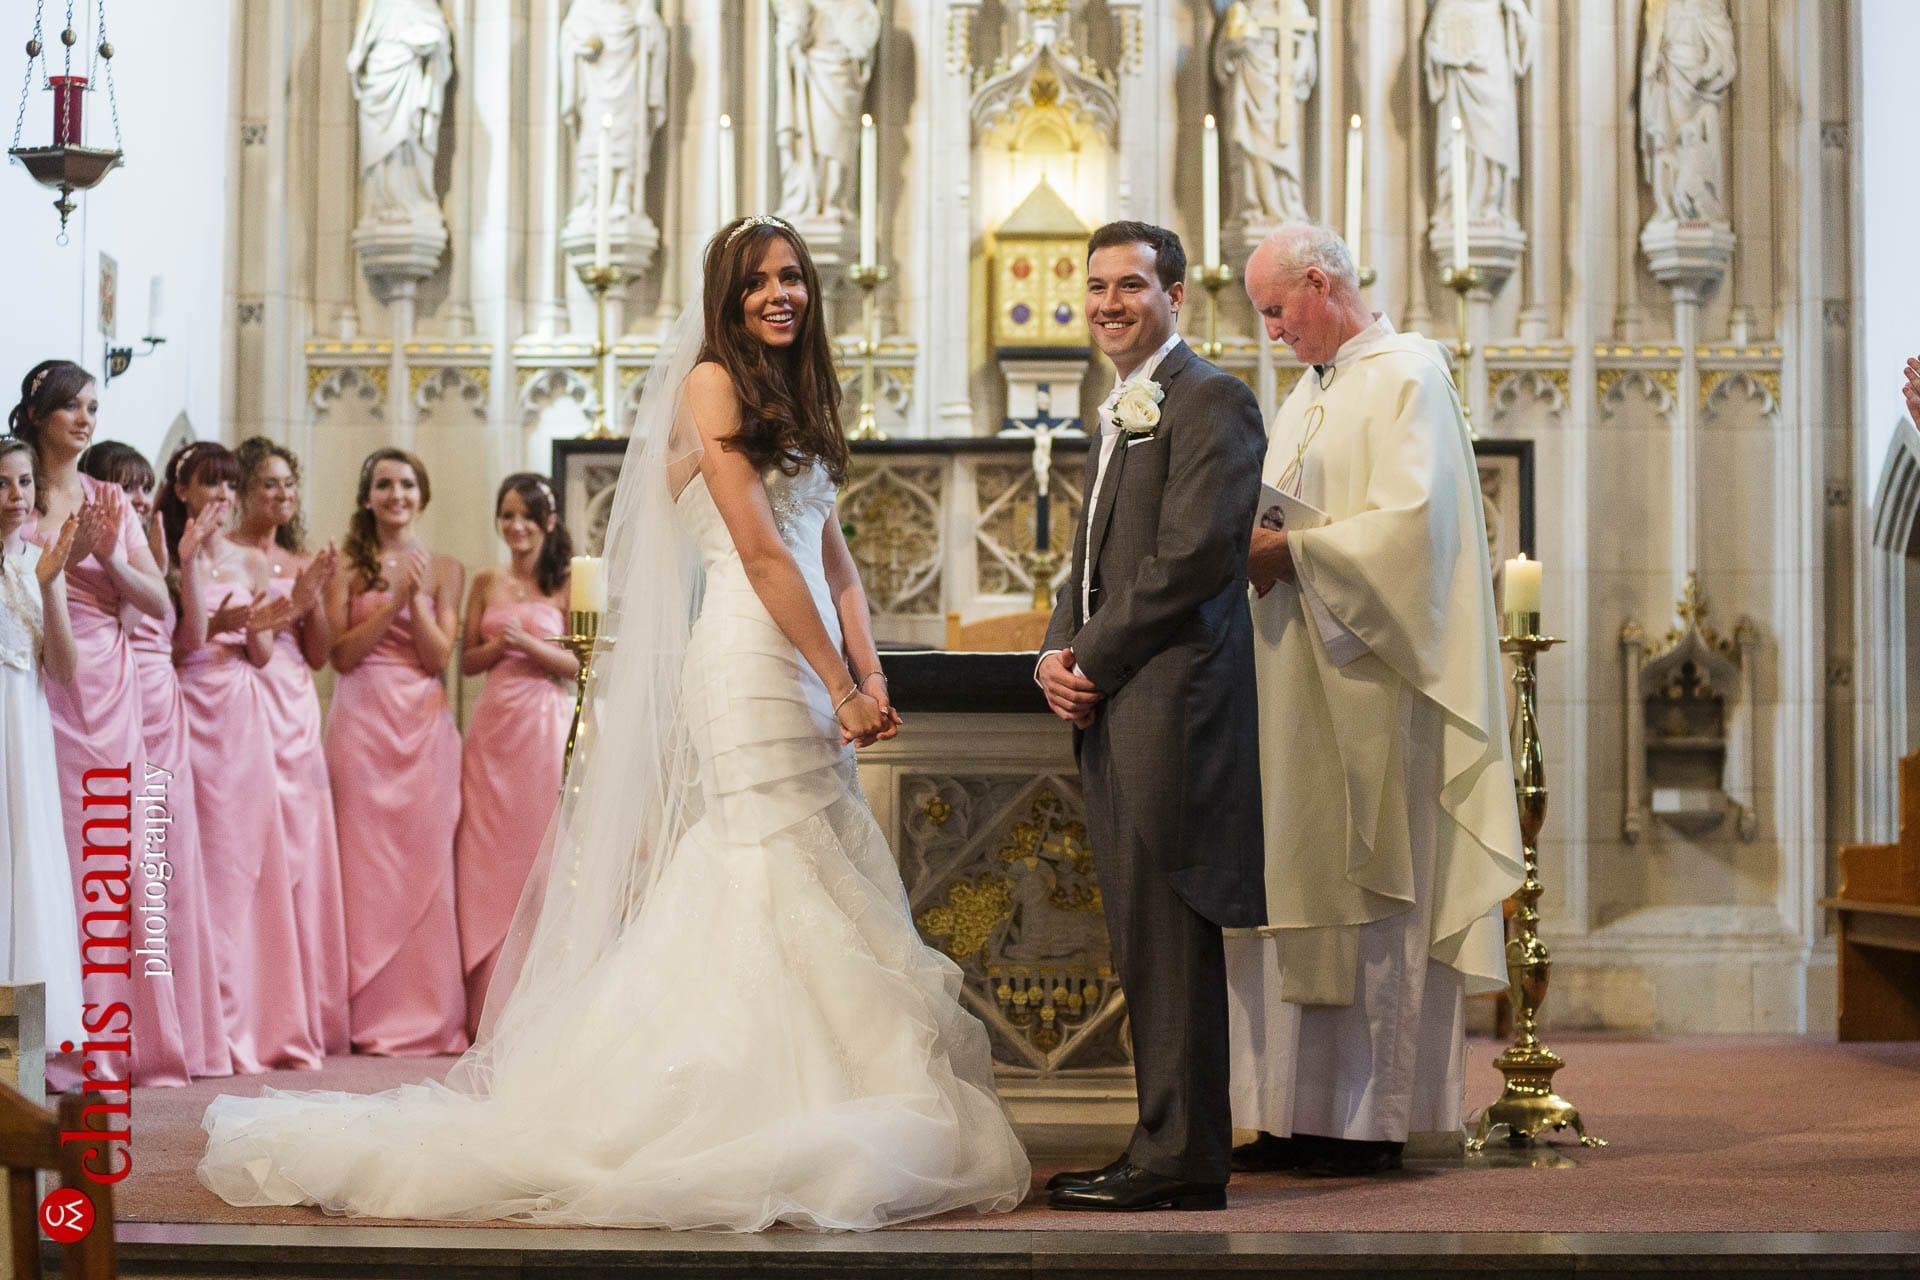 Brocket-Hall-wedding-photography-019